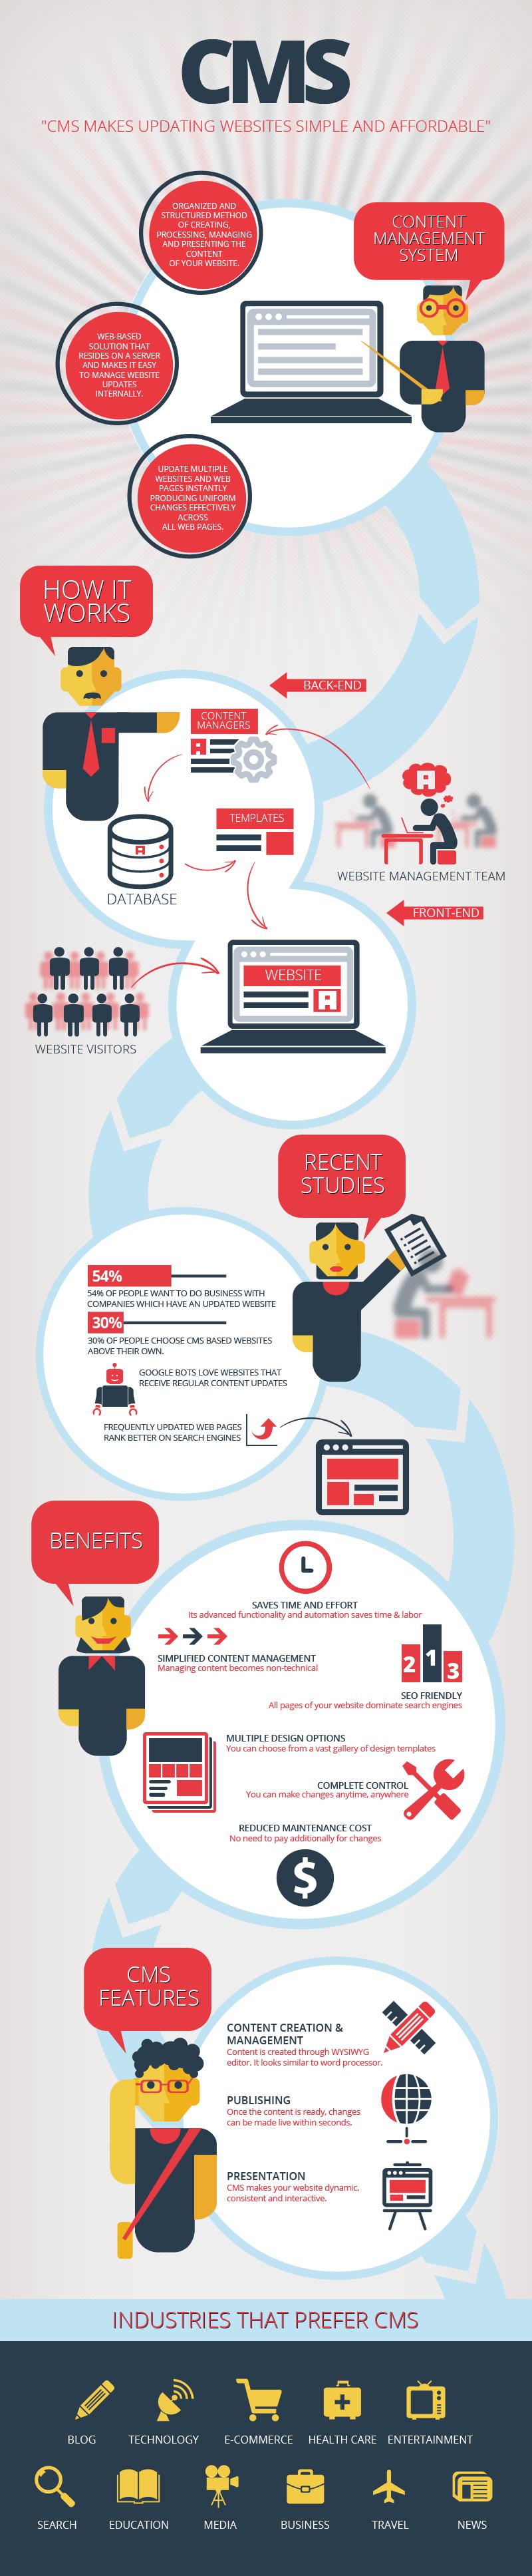 CMS Infographic